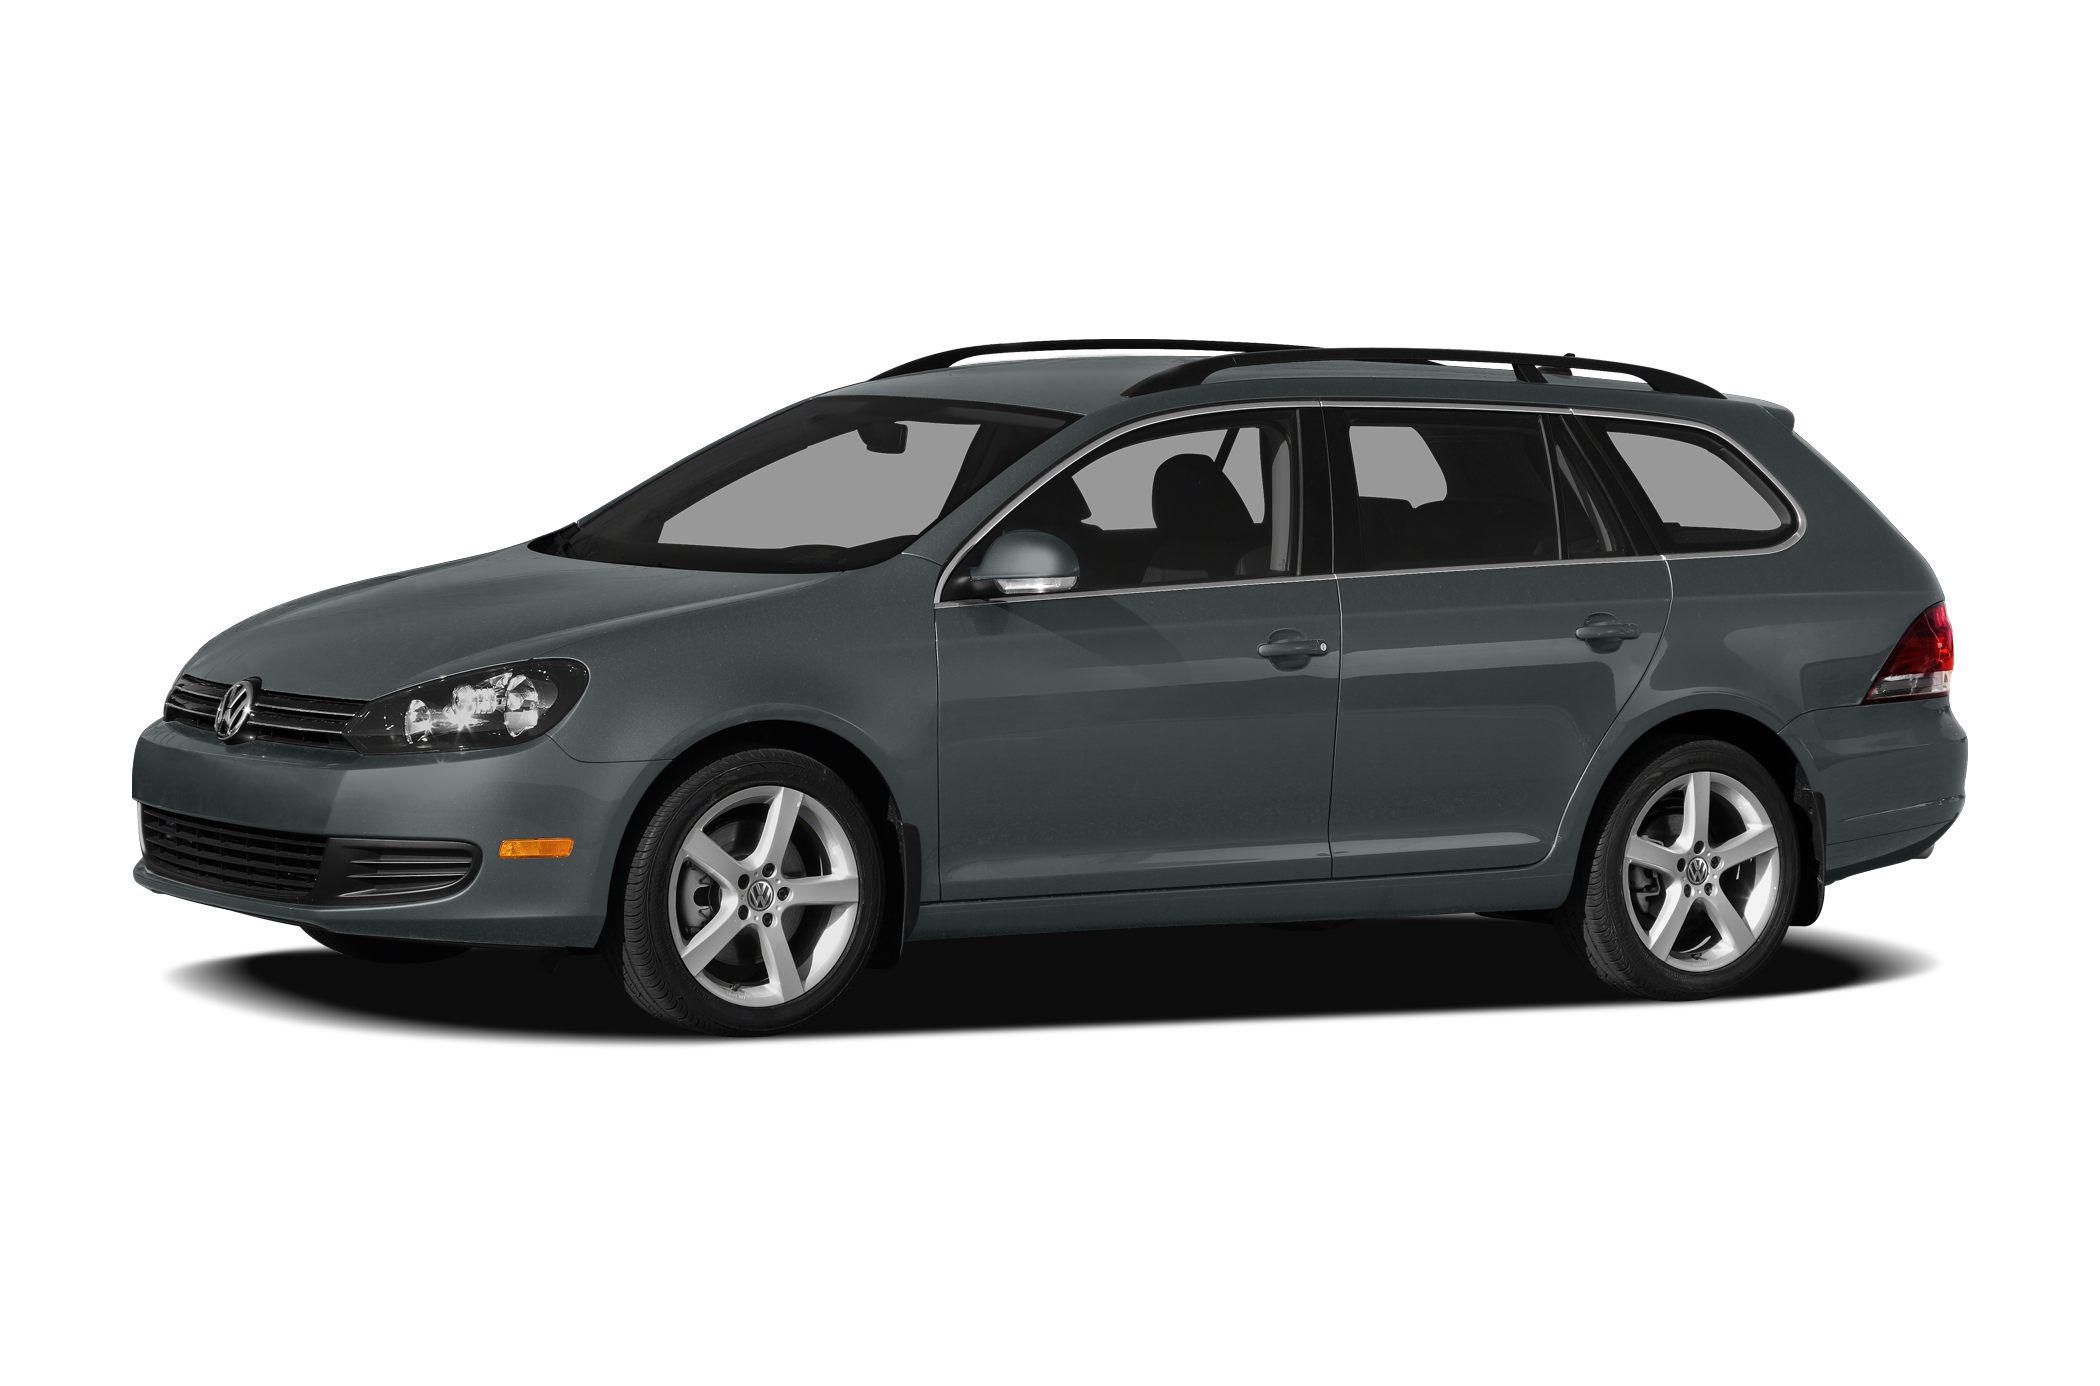 2012 Volkswagen Jetta SportWagen TDI Wagon for sale in Albuquerque for $18,999 with 49,503 miles.